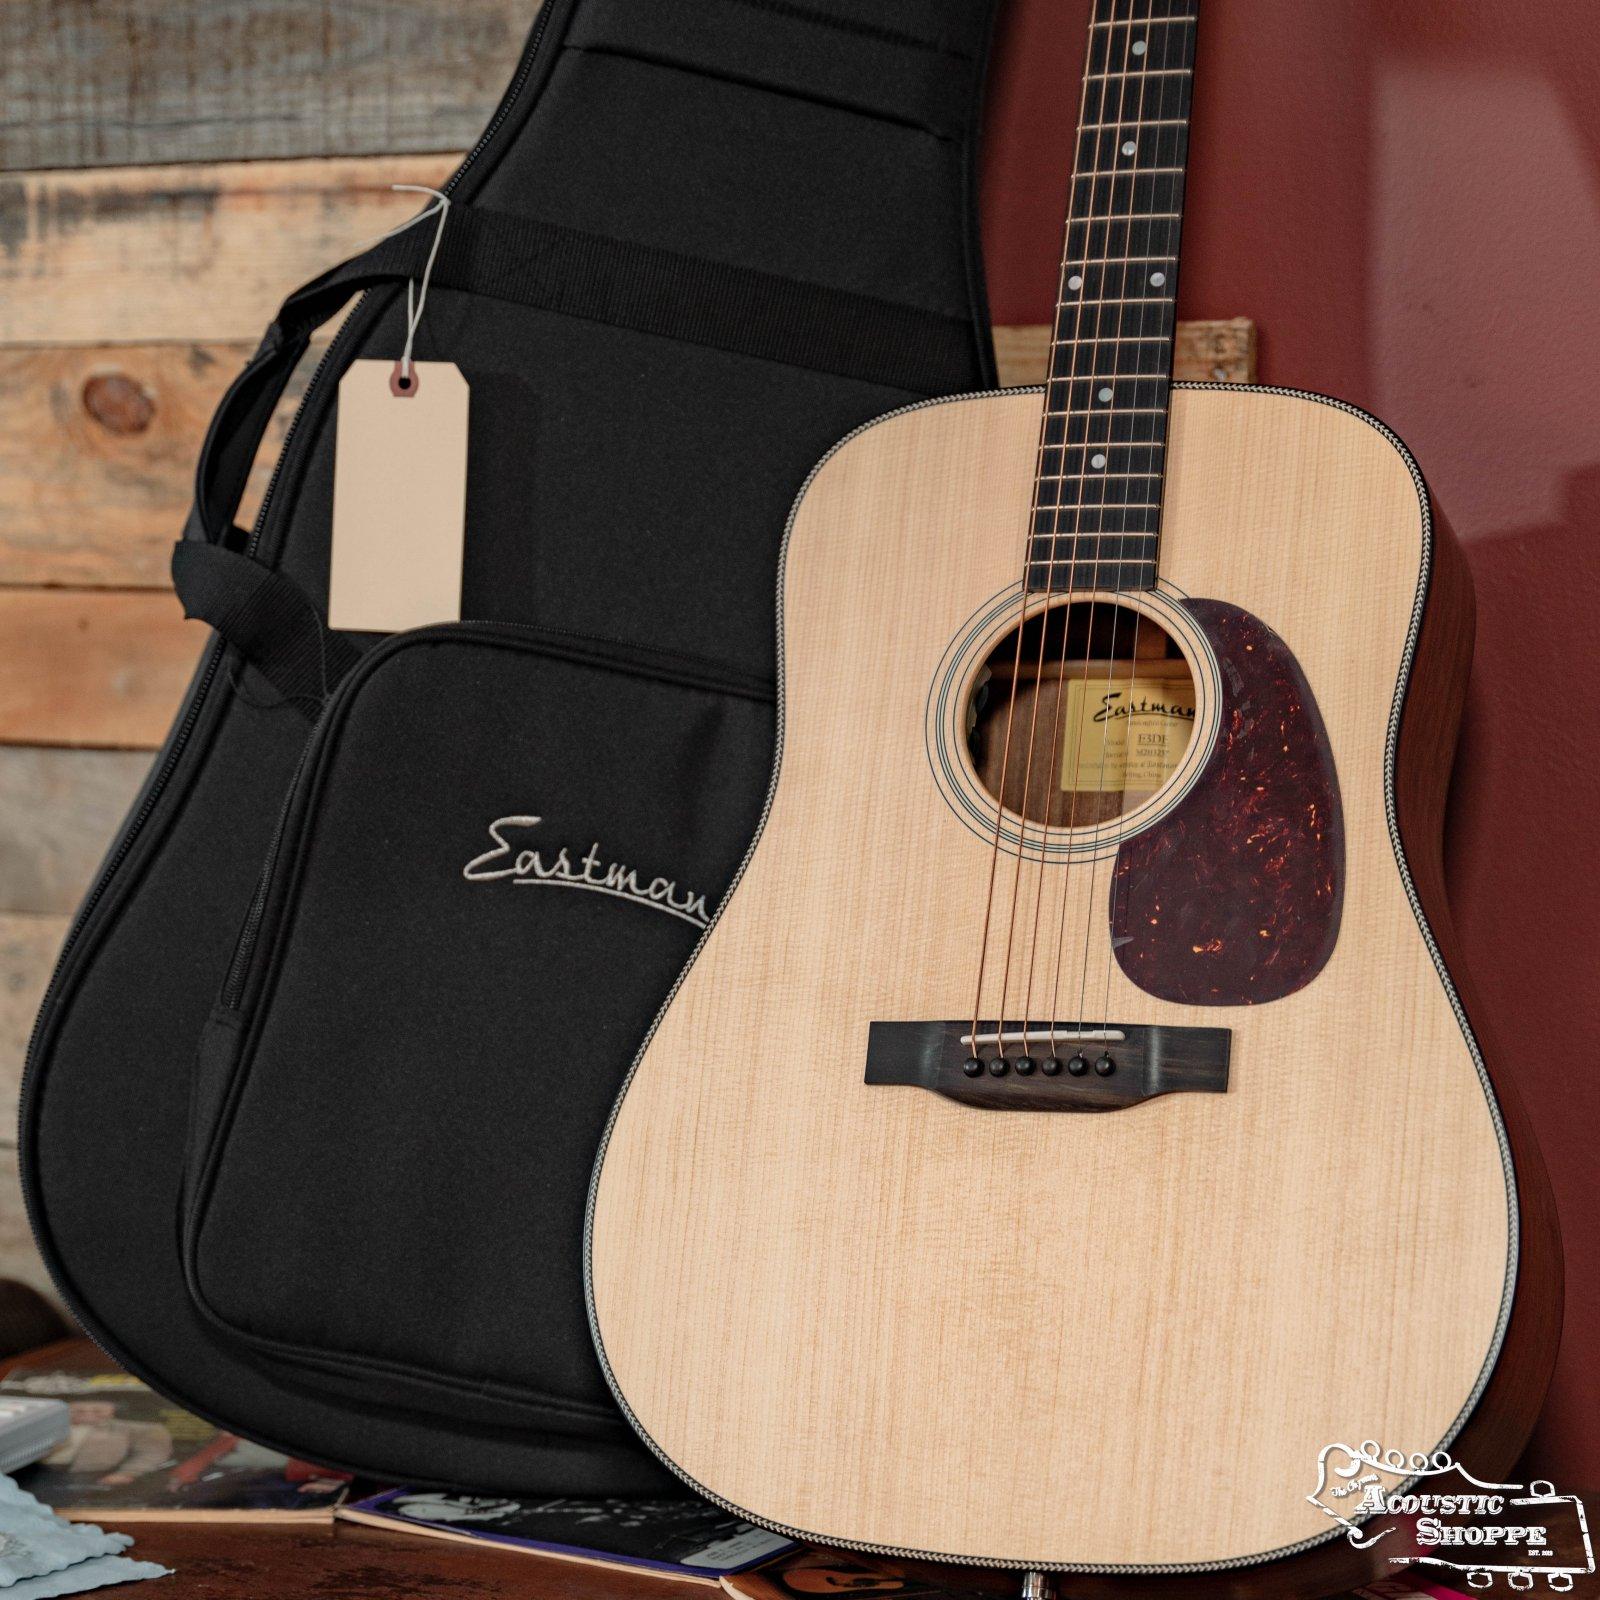 Eastman E3DE Sitka/Ovangkol Dreadnought Acoustic w/ Fishman Pickup #3257